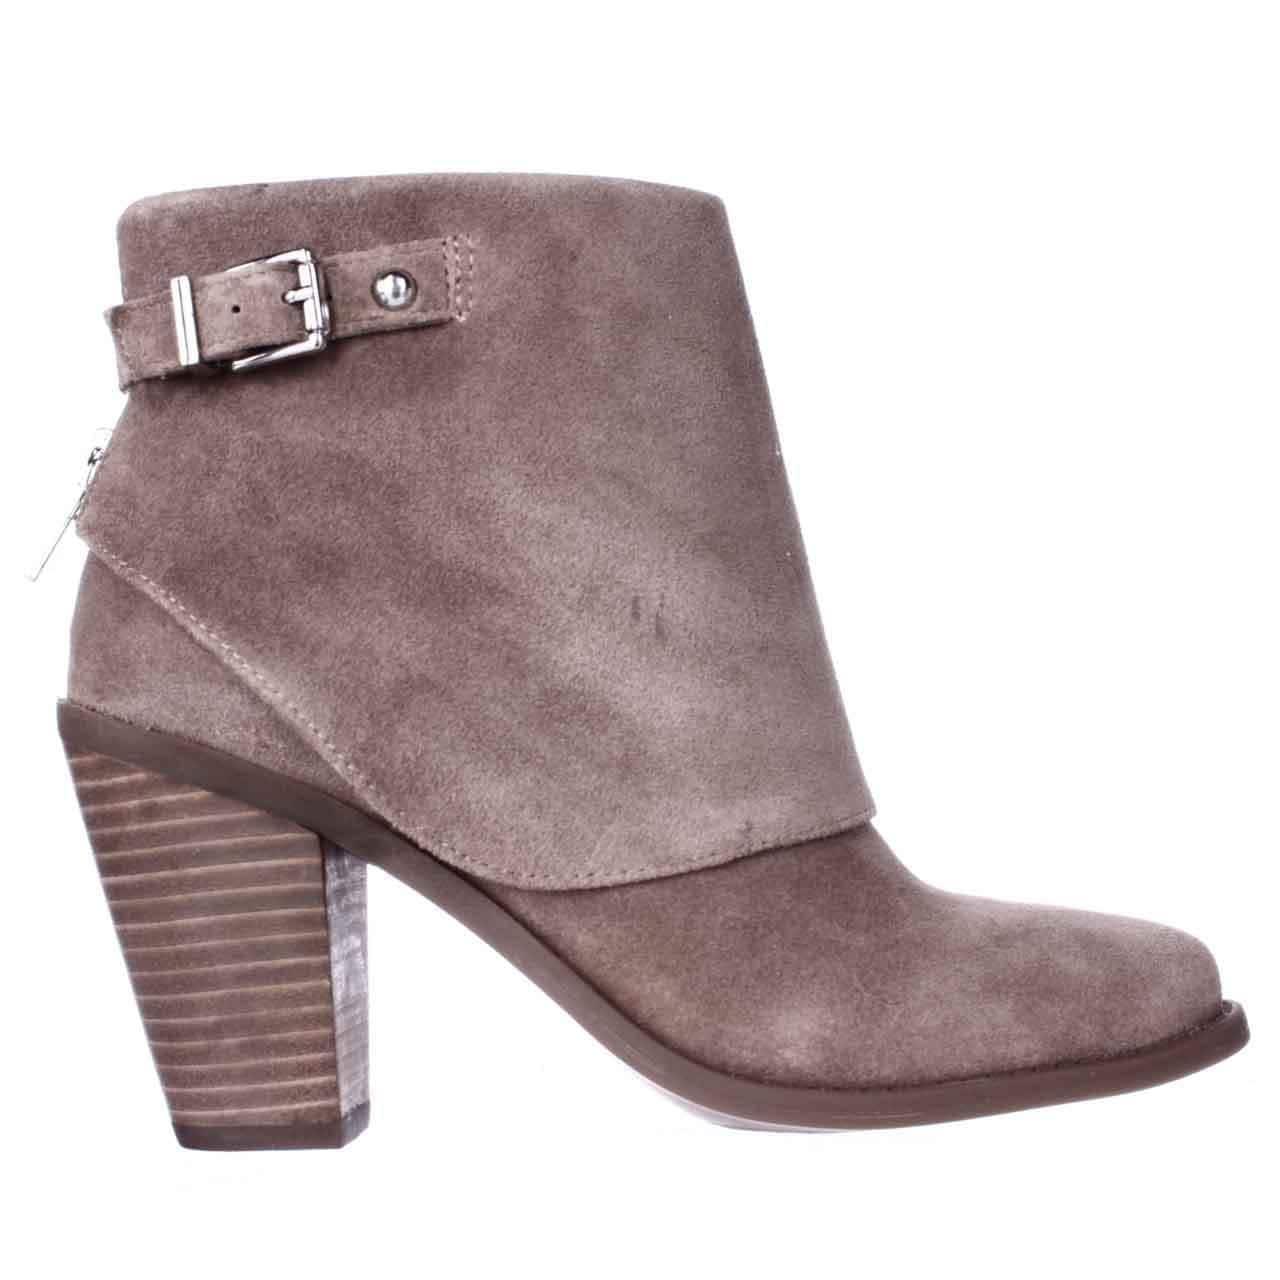 d7514f619f8 Jessica Simpson Caralyne Ankle Cuff Block Heel Booties